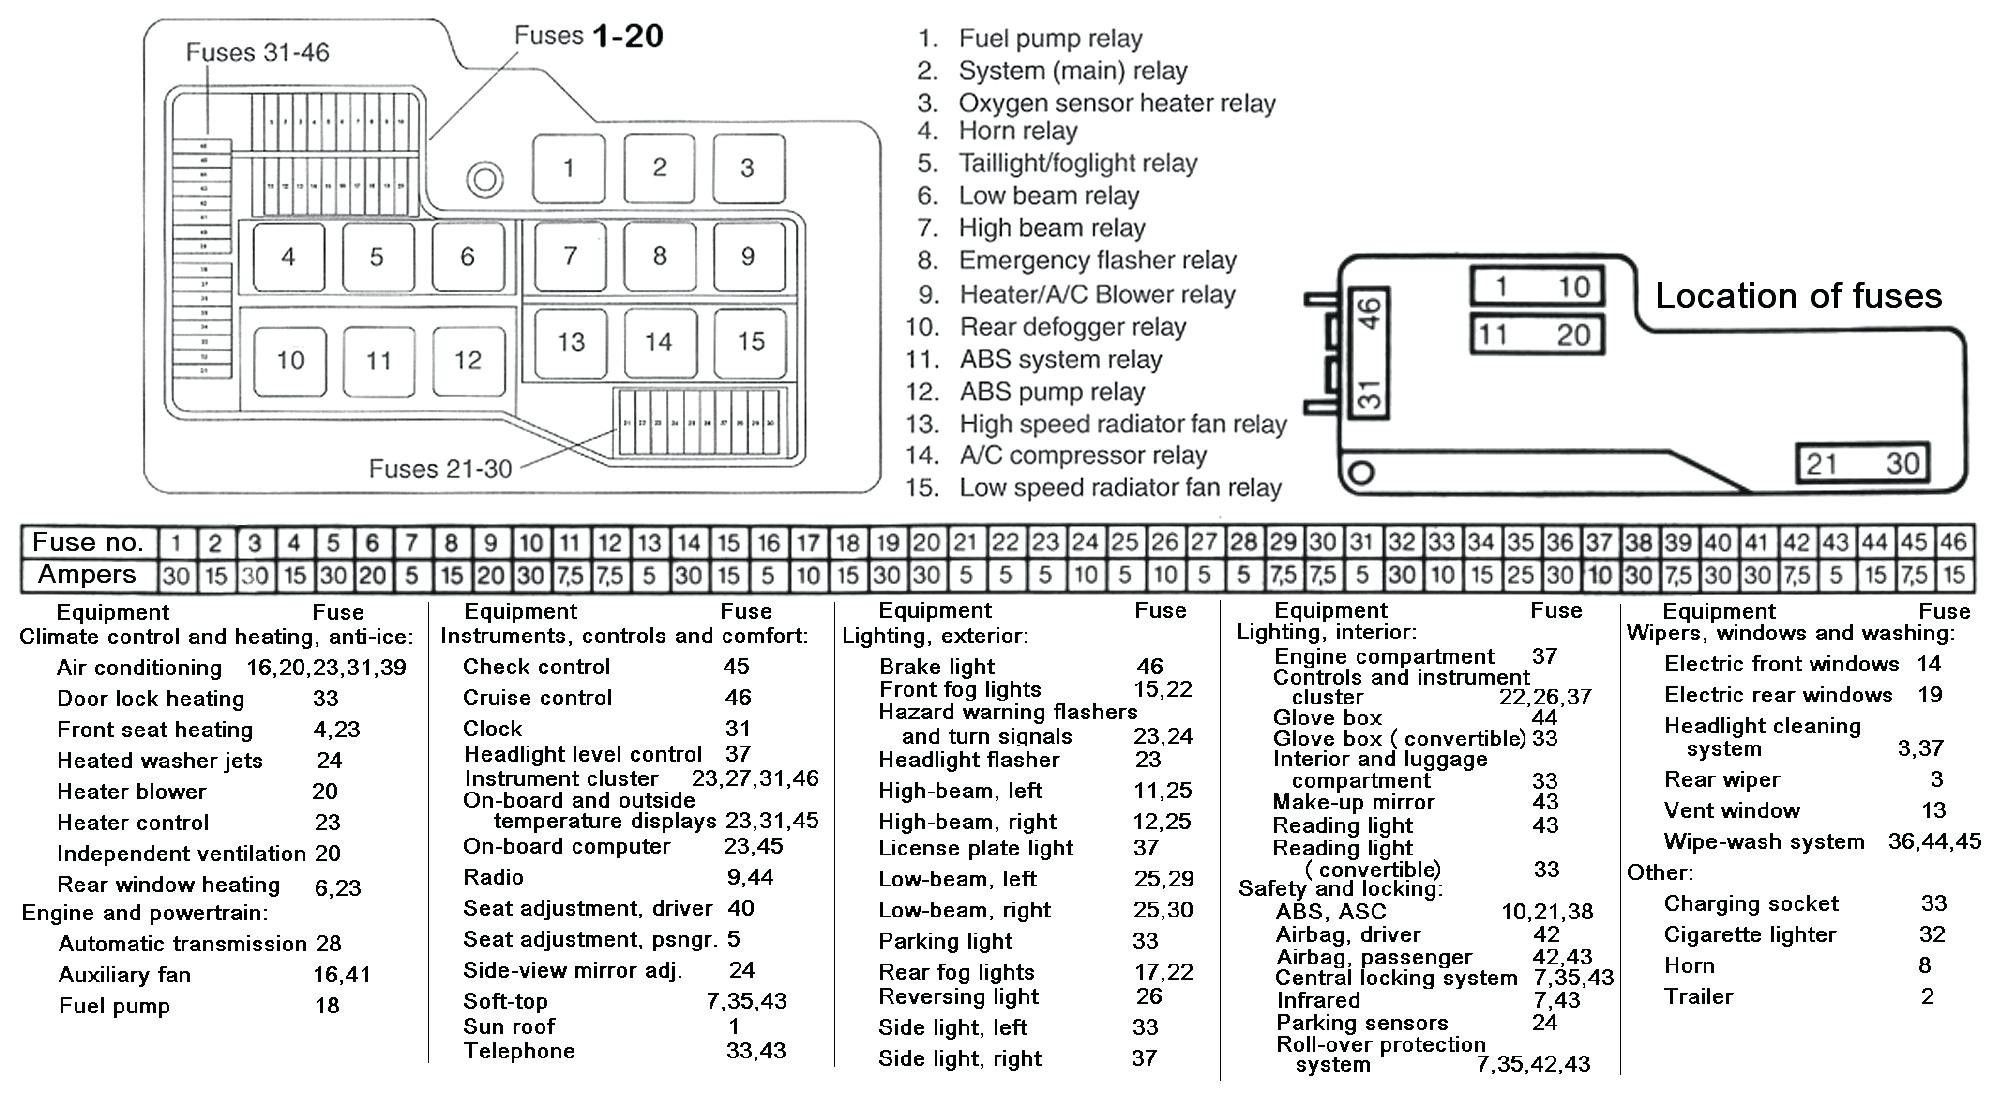 Unique Wiring Diagram for Electric Fan #diagram #diagramsample  #diagramtemplate #wiringdiagram #diagramchart #worksheet #worksheettemplate  | MobilPinterest